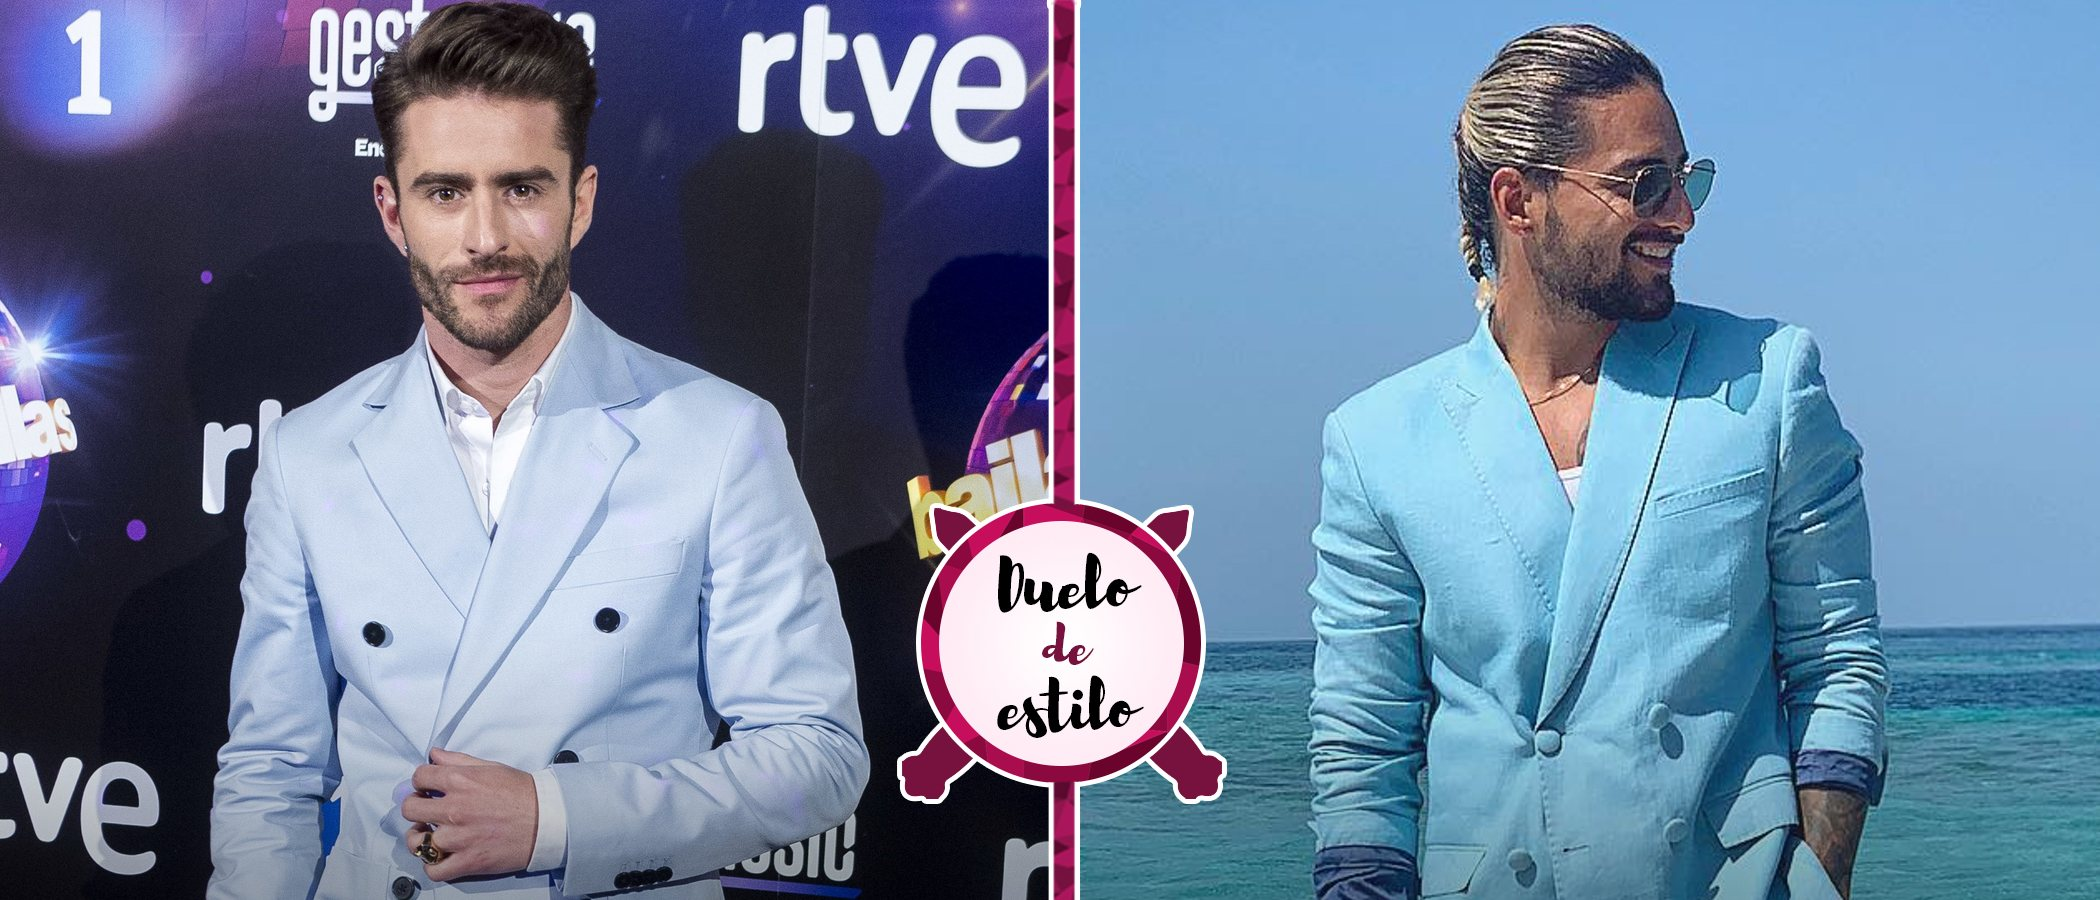 Duelo de estilo: ¿A quién le sientan mejor los looks de Pelayo Díaz? ¿A Pelayo Díaz o a Maluma?